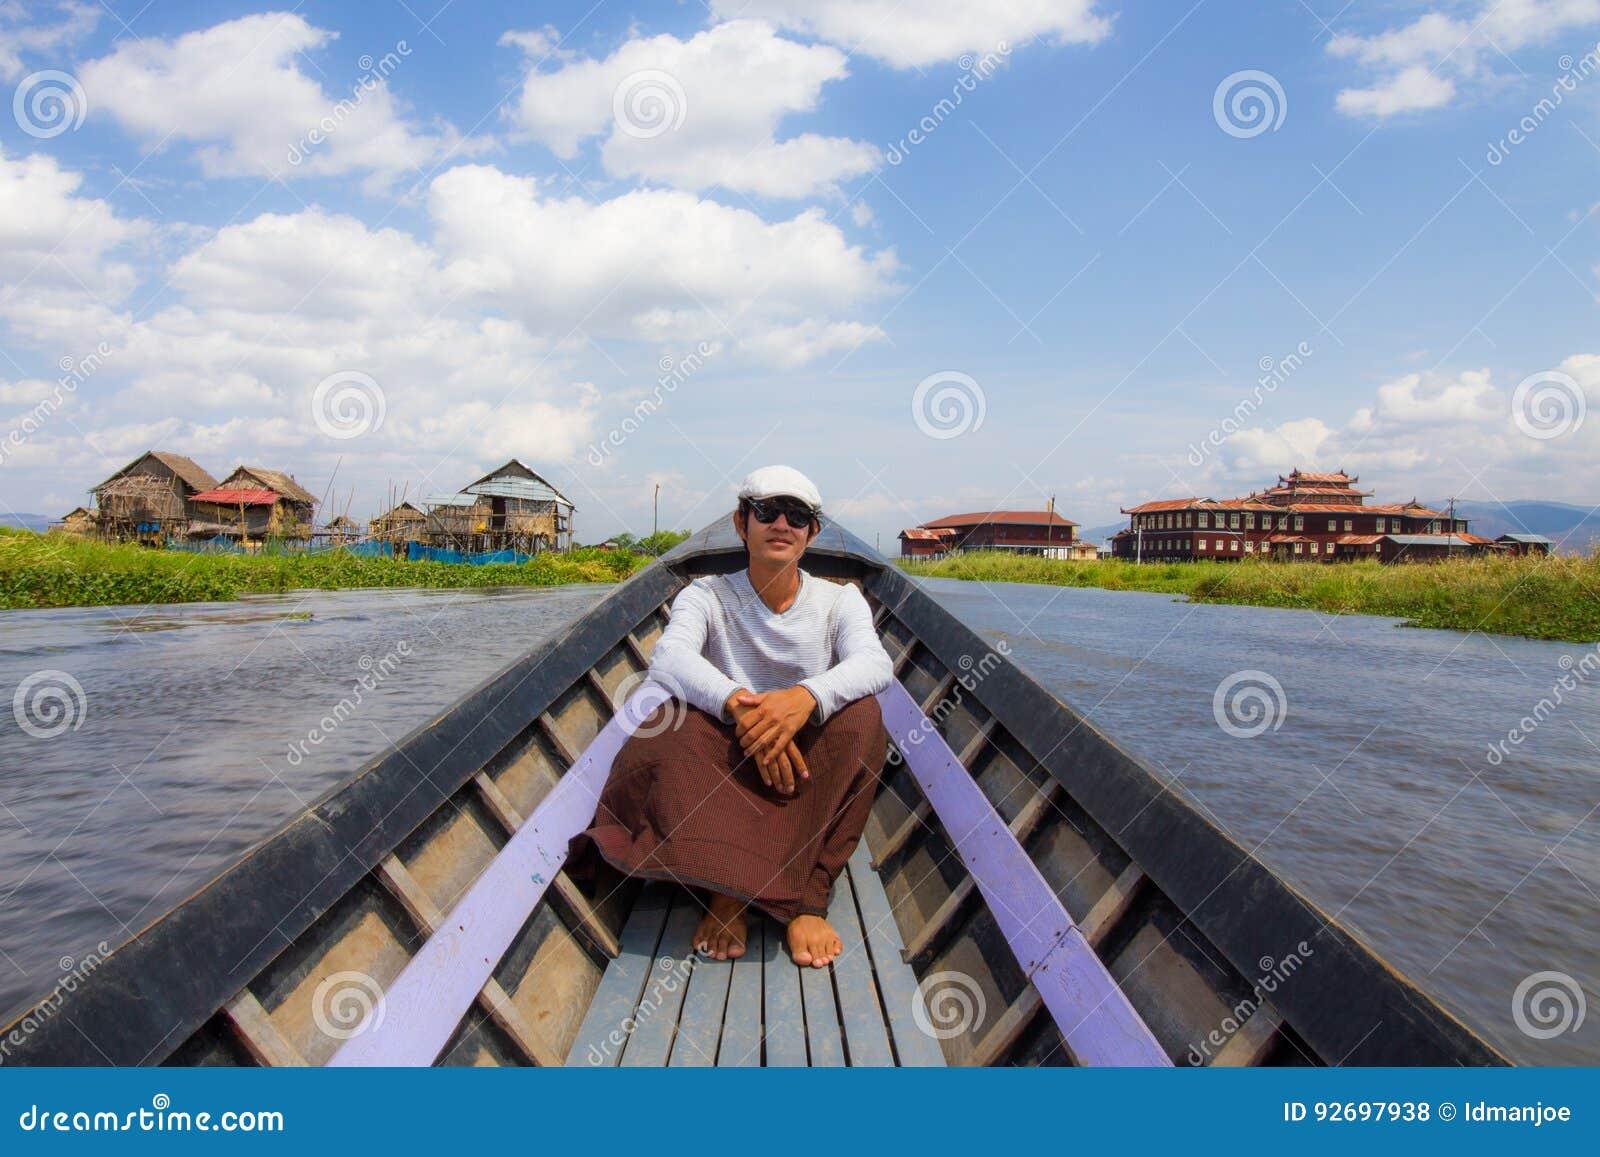 Floating Gardens On Inle Lake Myanmar Editorial Image - Image ...